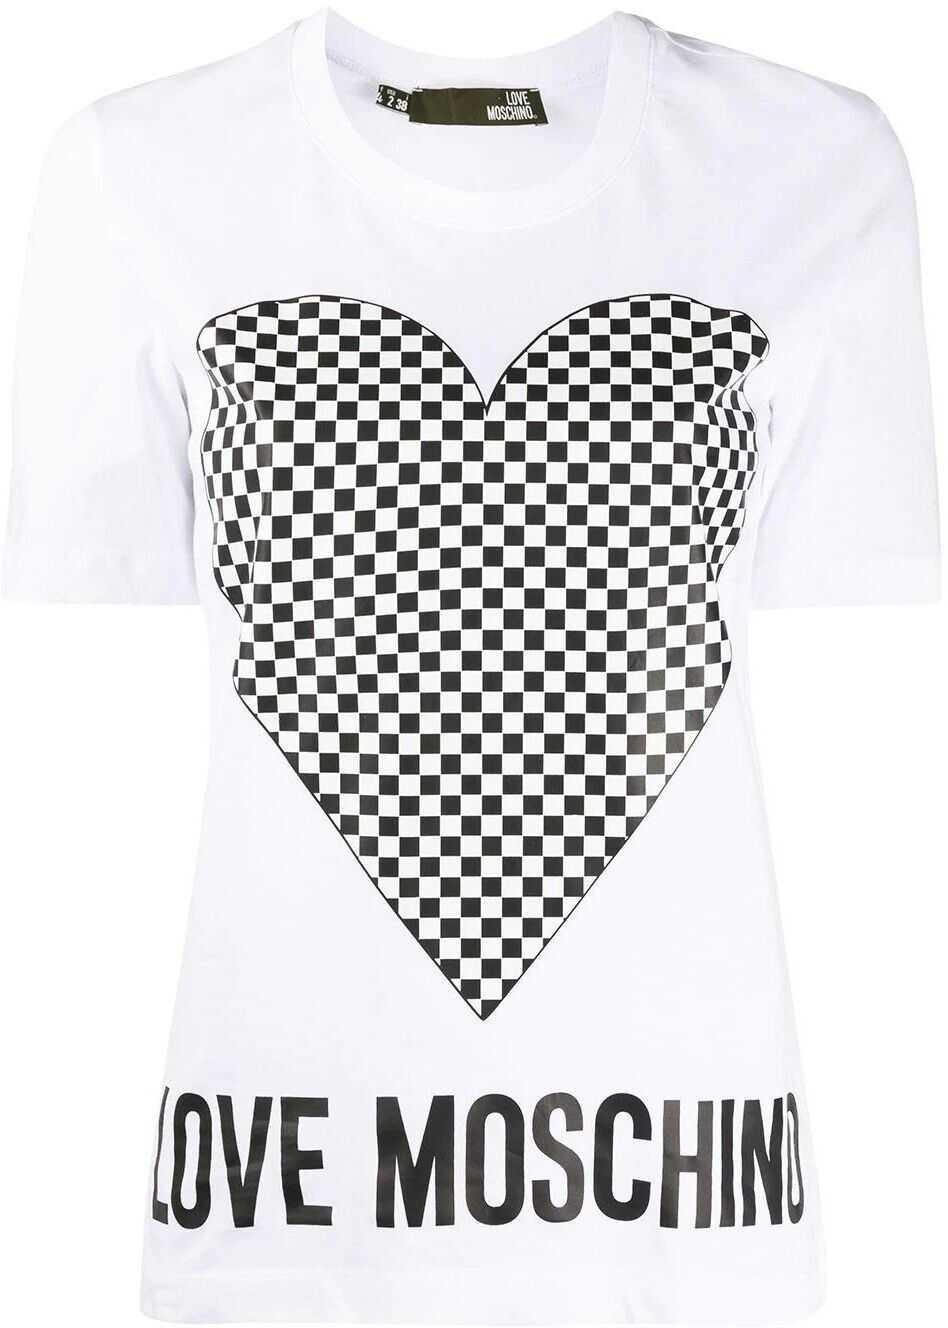 LOVE Moschino Cotton T-Shirt WHITE